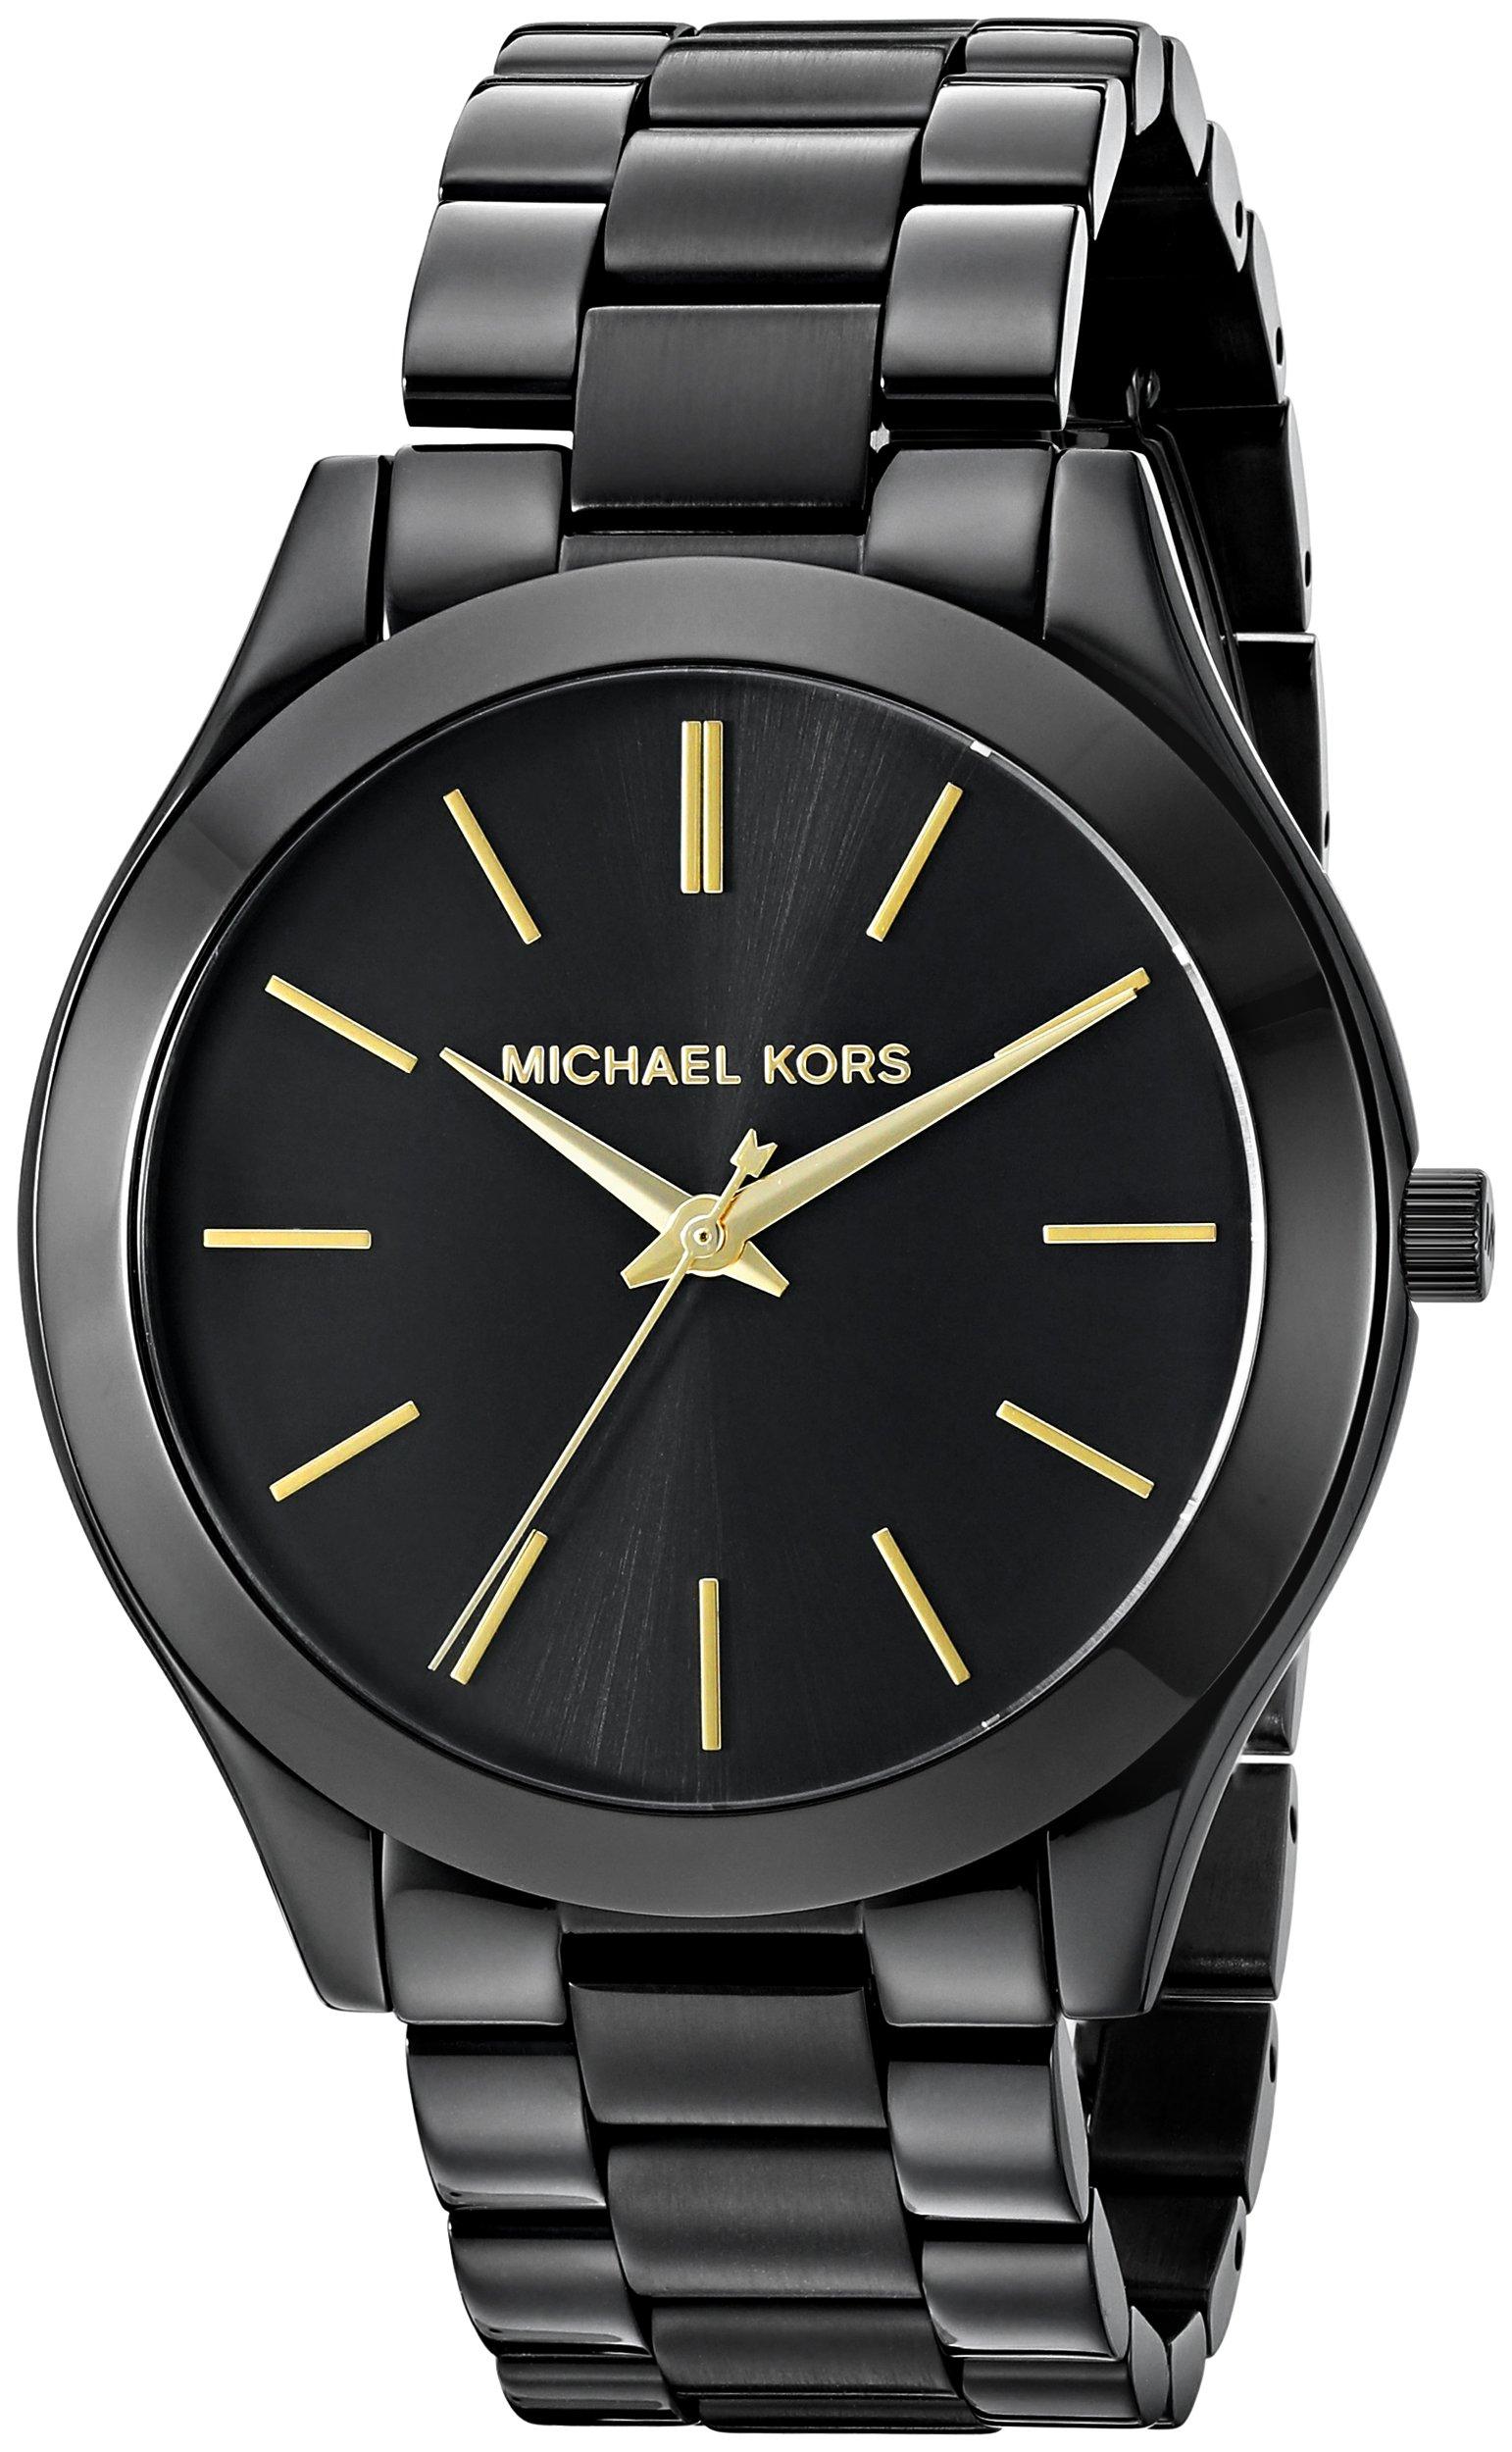 563a49b99591 Michael Kors Watches Slim Runway Watch